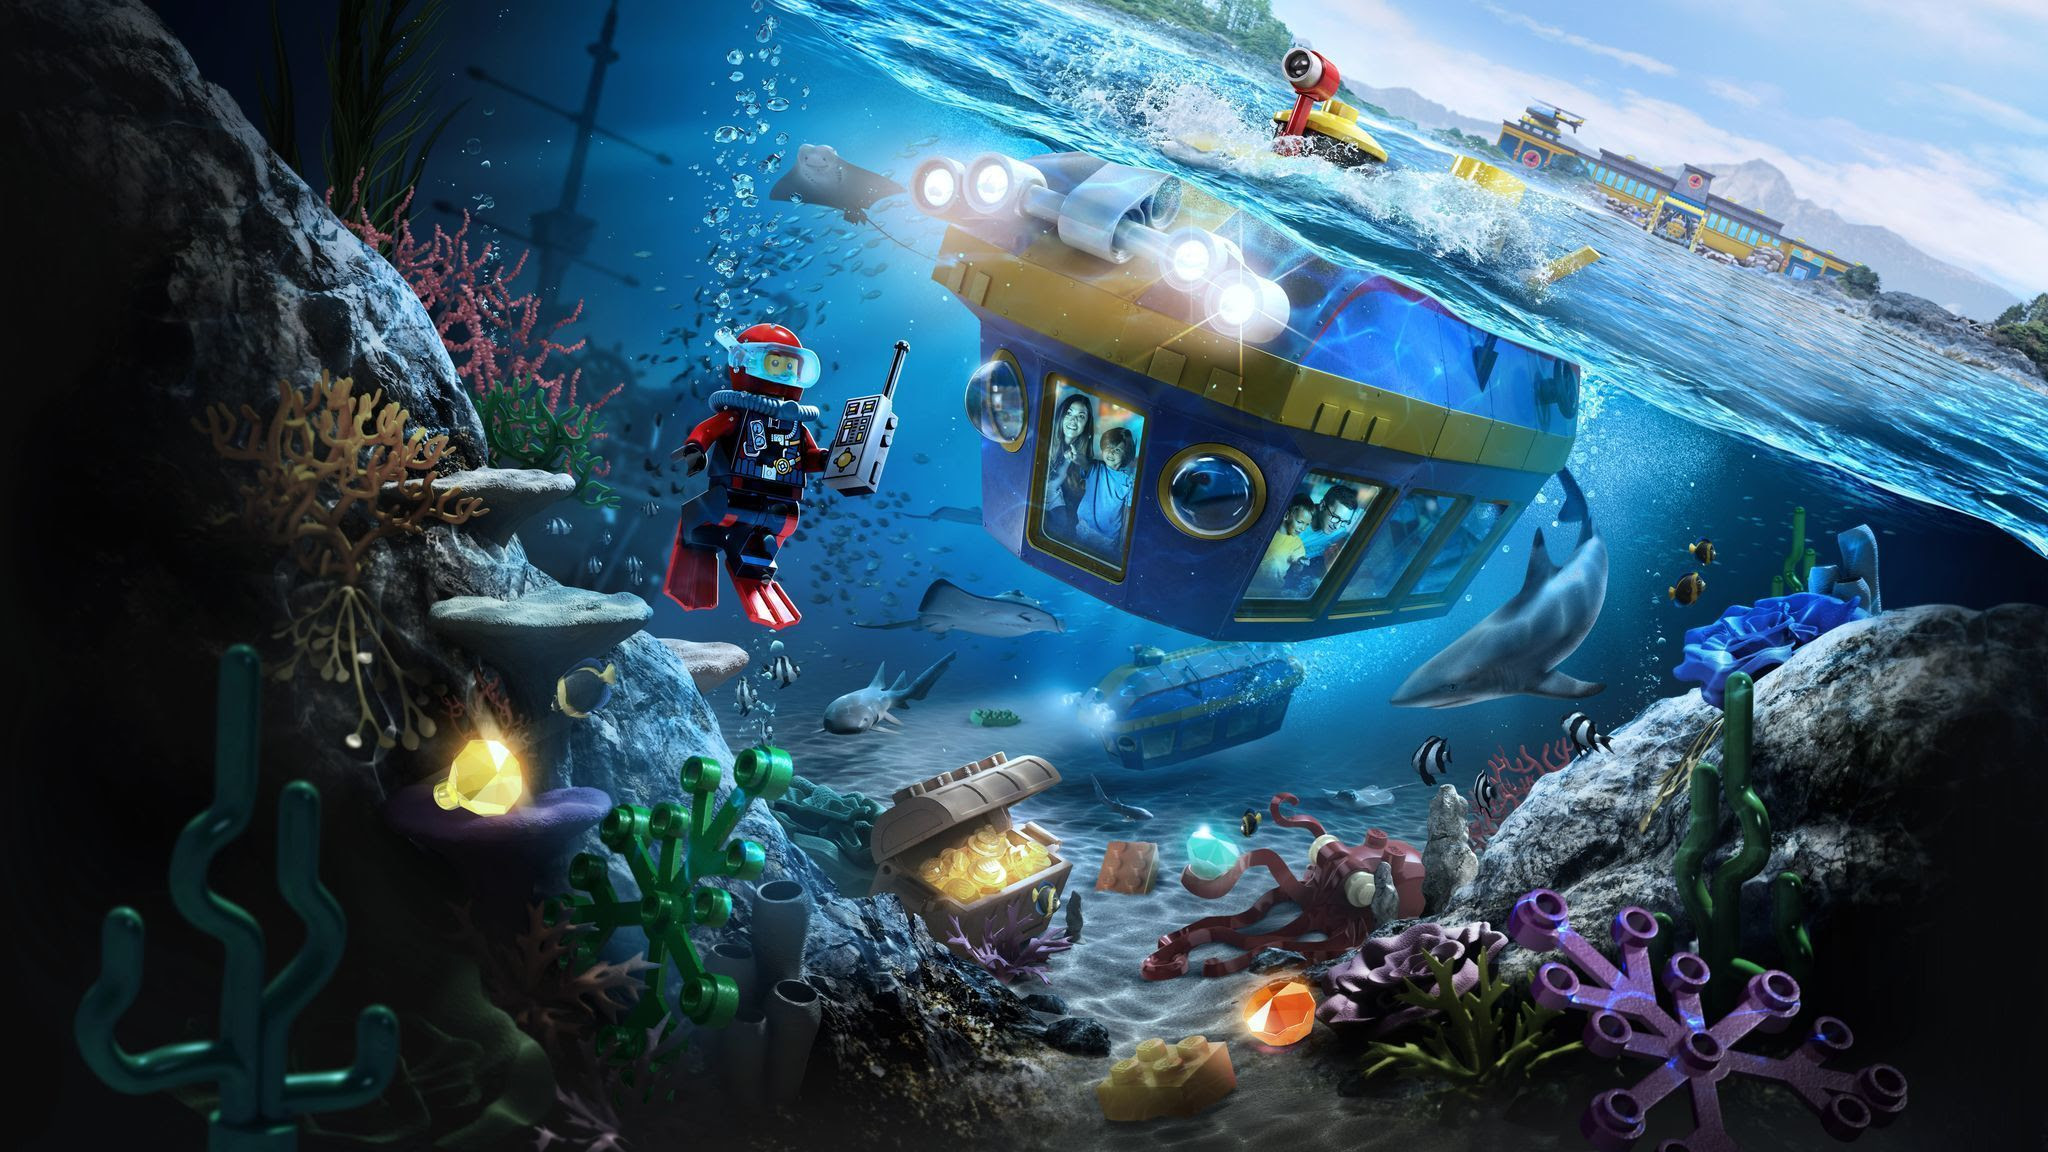 Image result for legoland submarine'